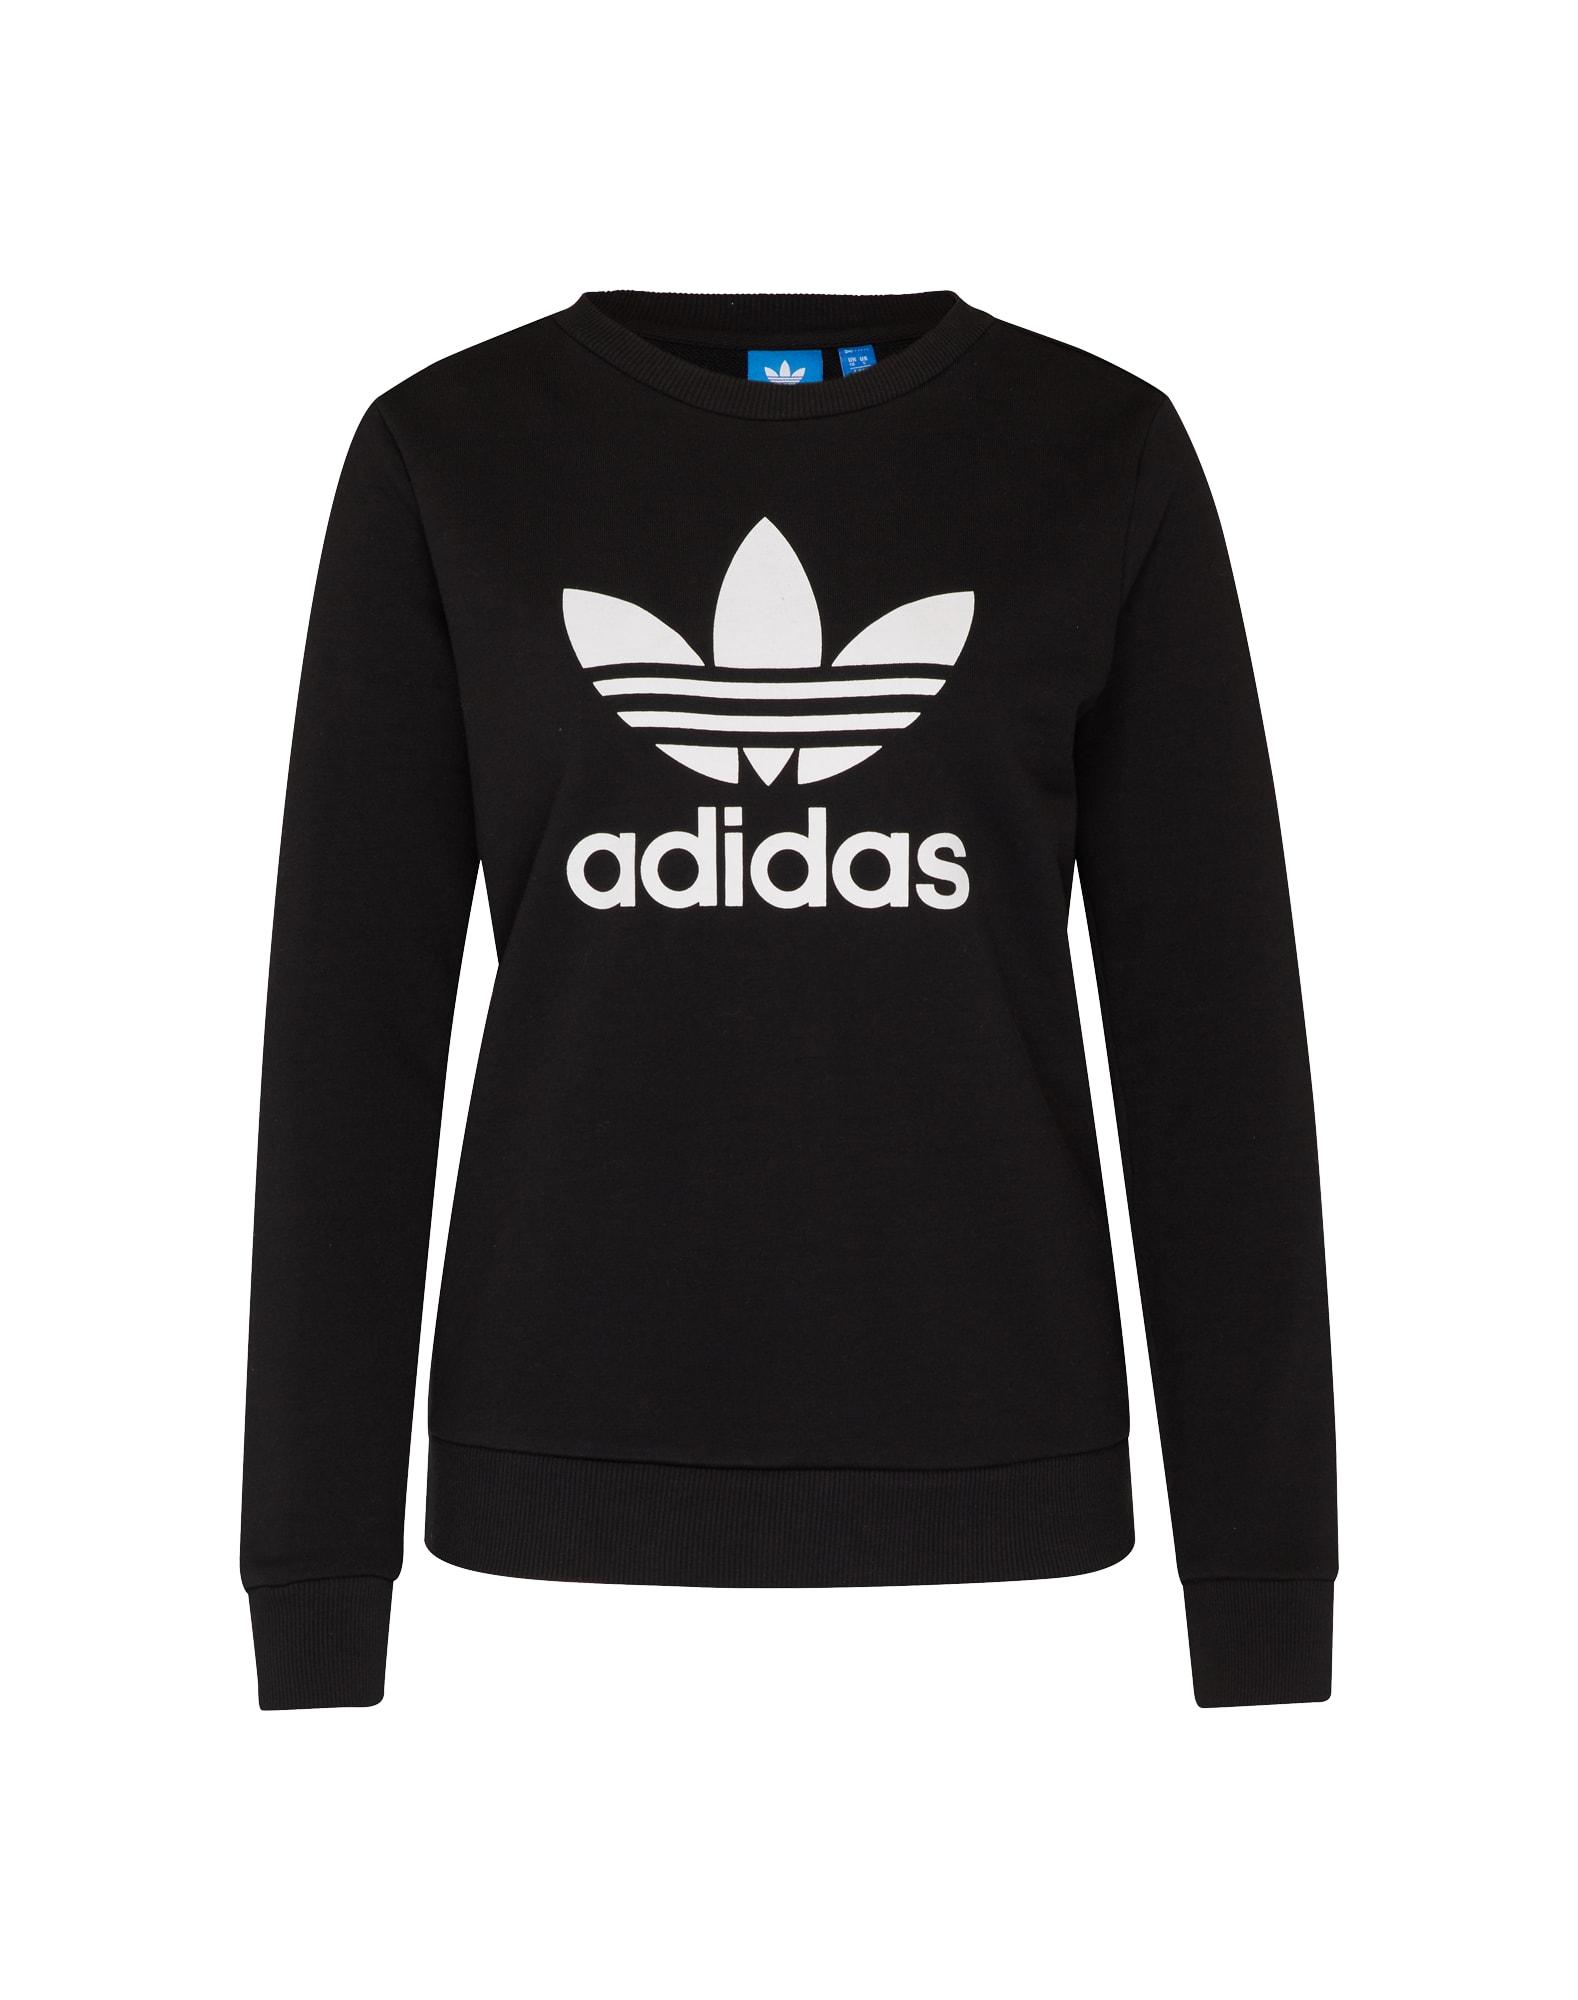 ADIDAS ORIGINALS, Dames Sweatshirt 'TREFOIL CREW', zwart / wit